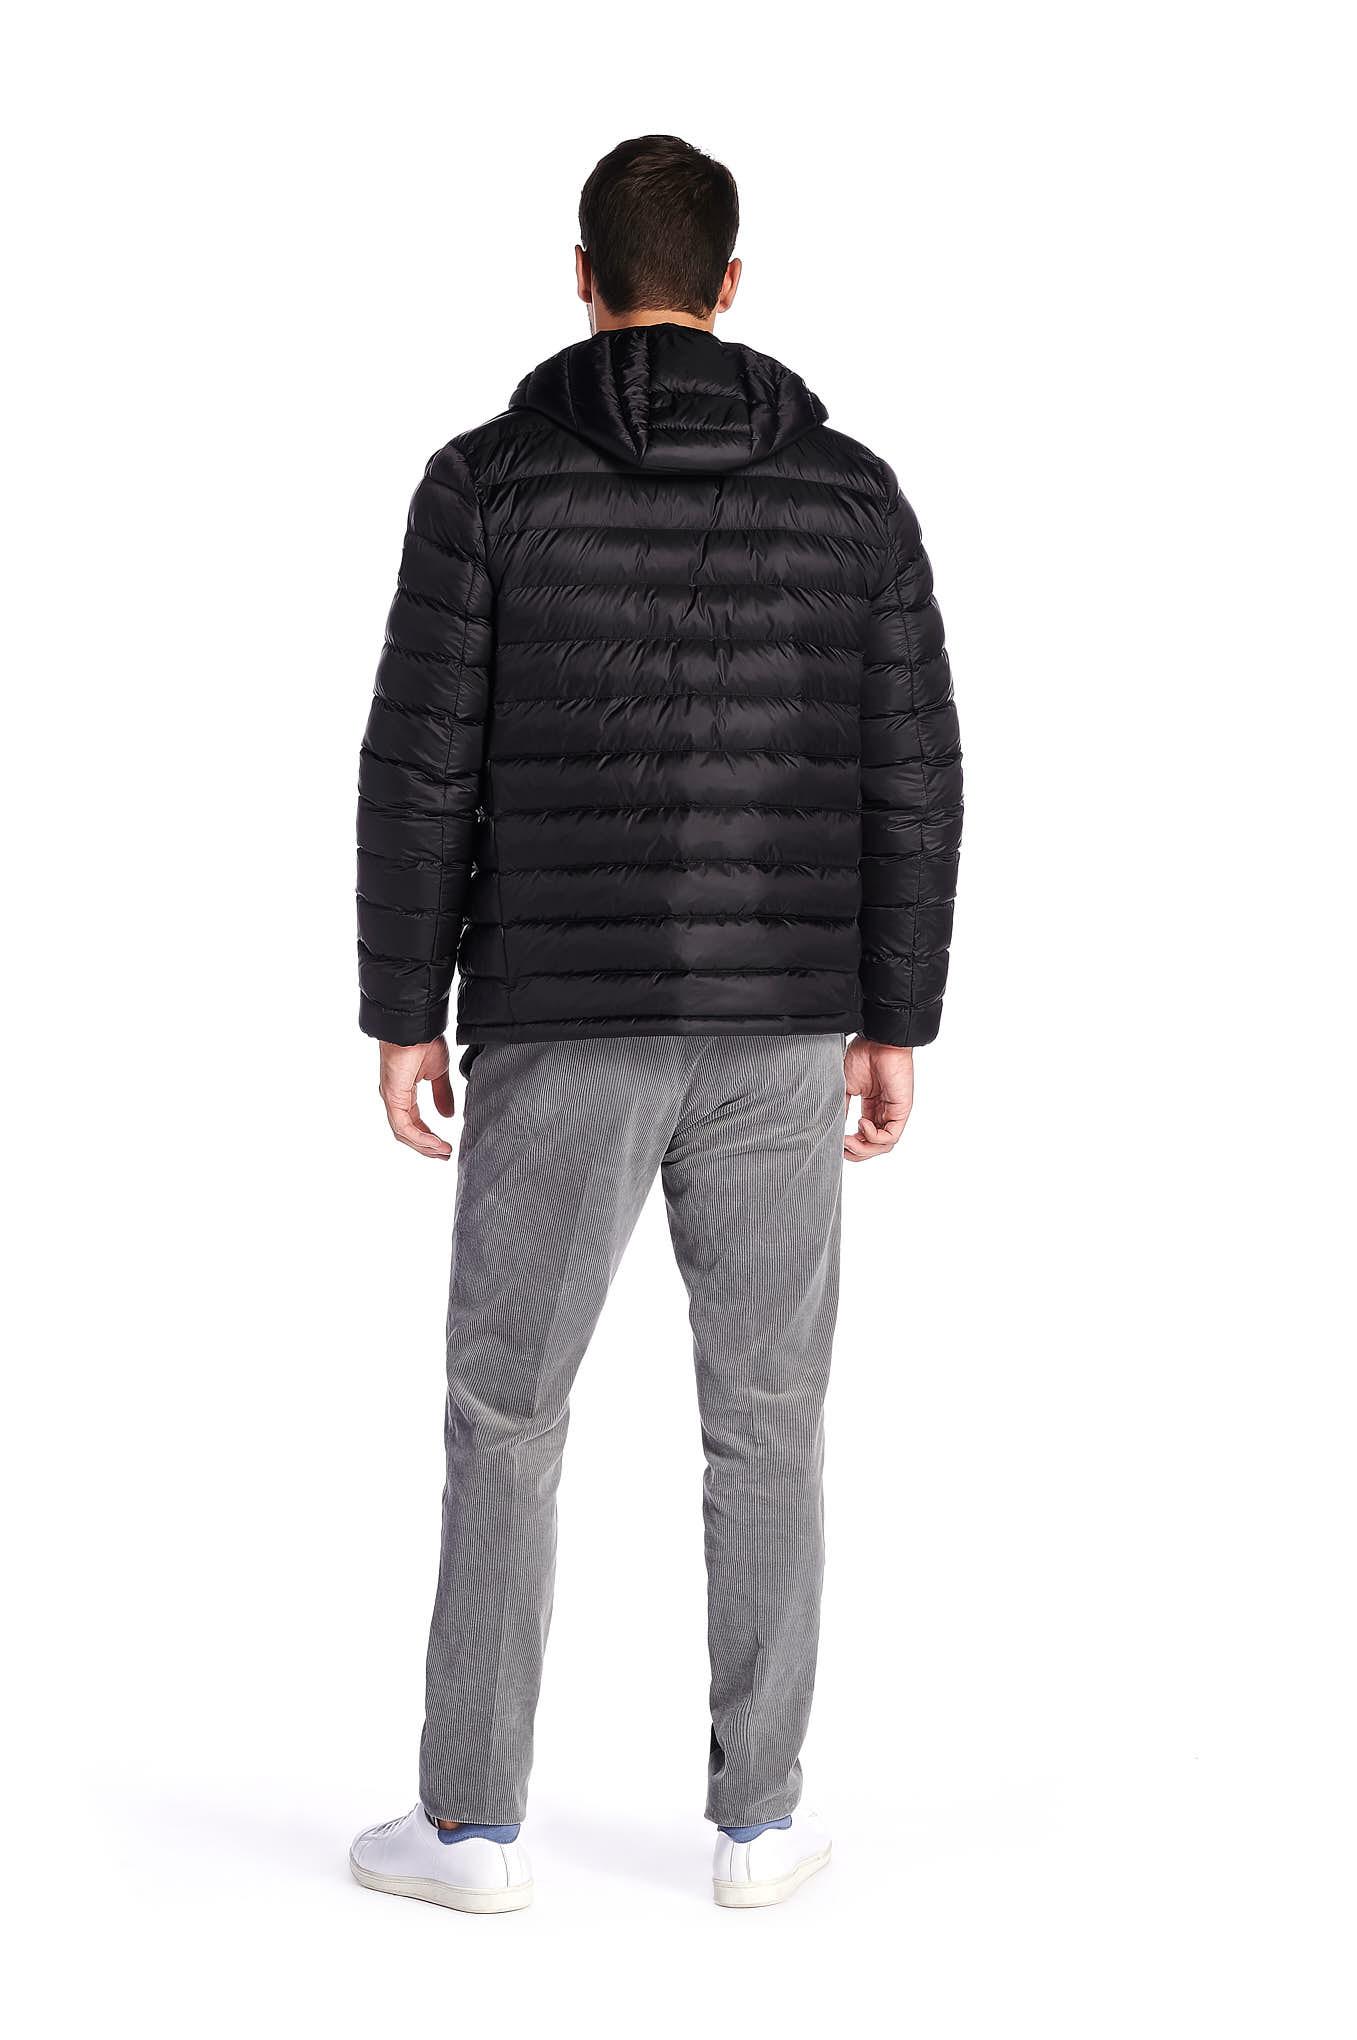 Jacket Black Casual Man